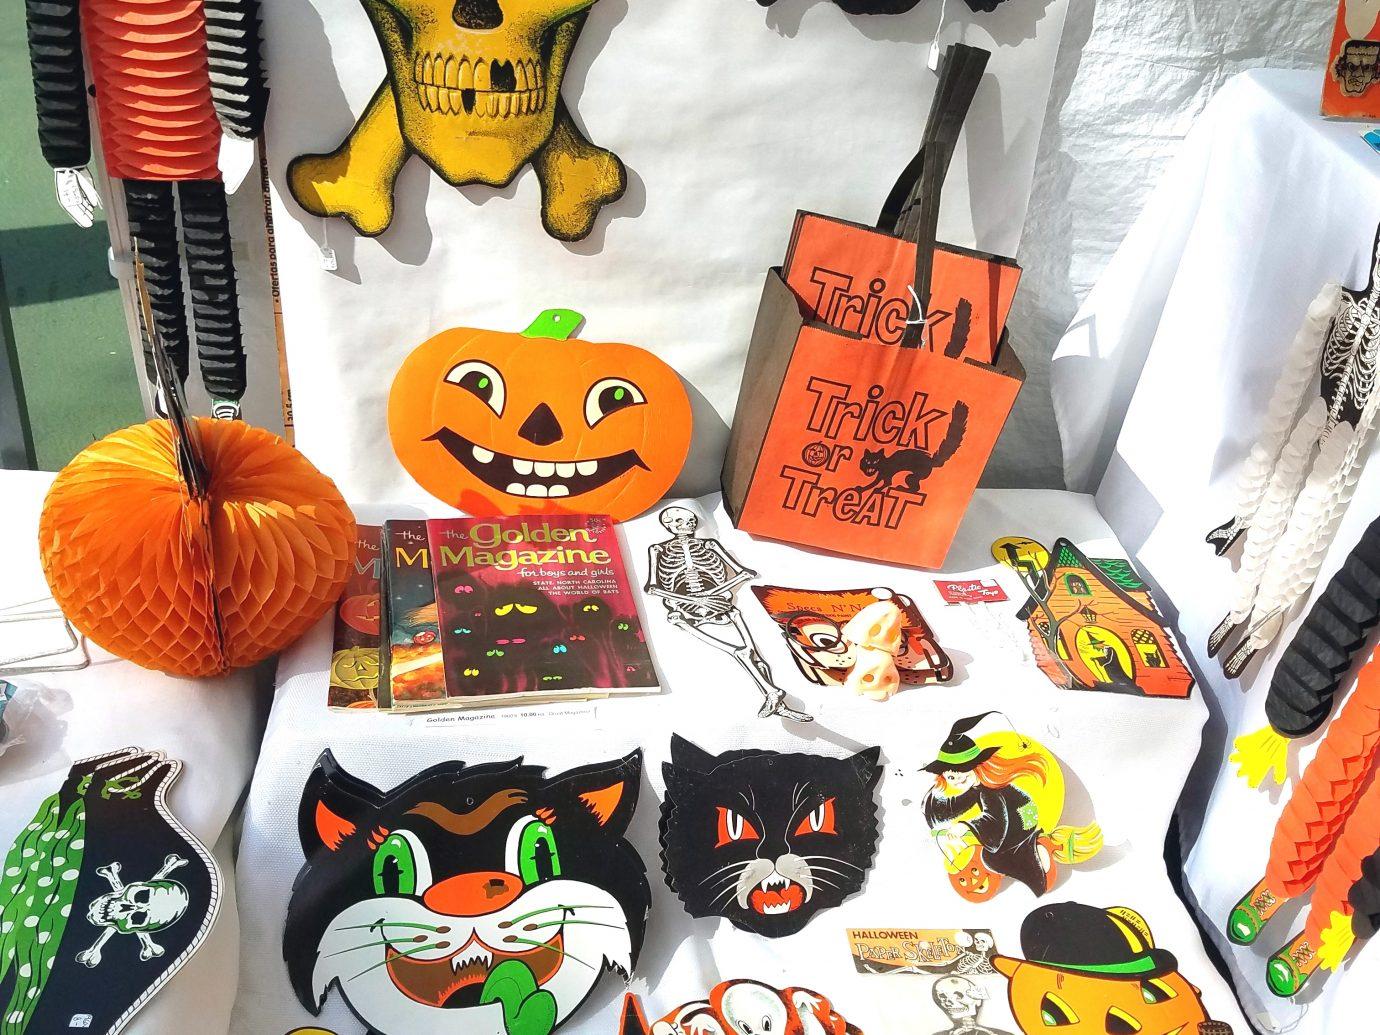 halloween decorations at Scary Bazaar